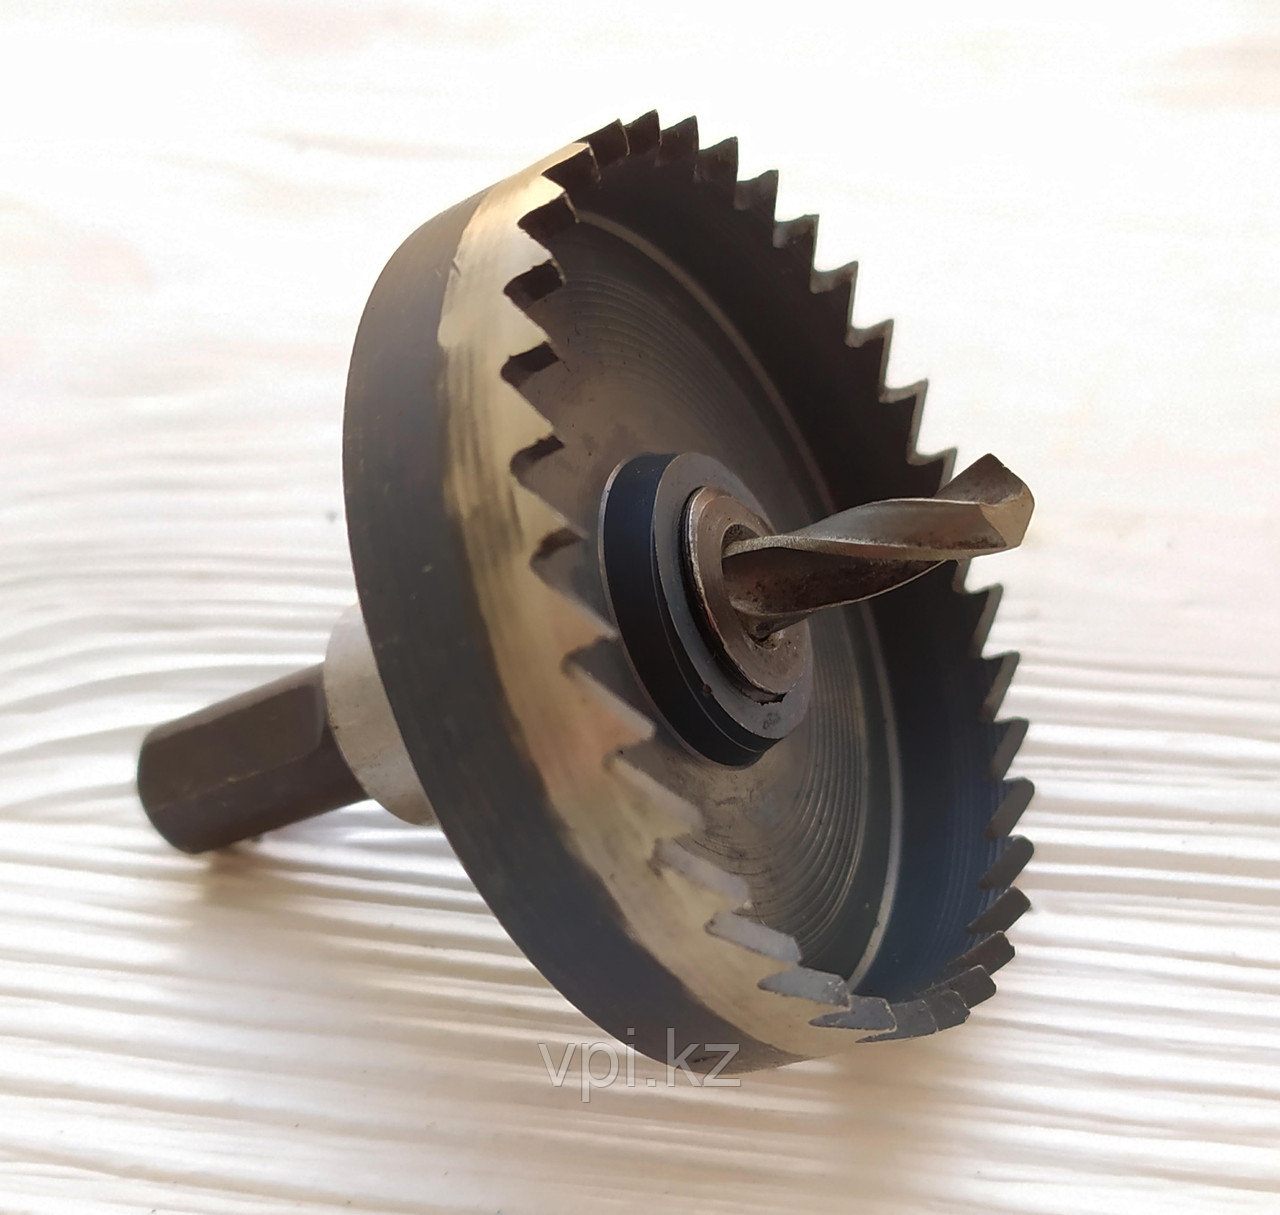 Сверло кольцевое по металлу 55мм